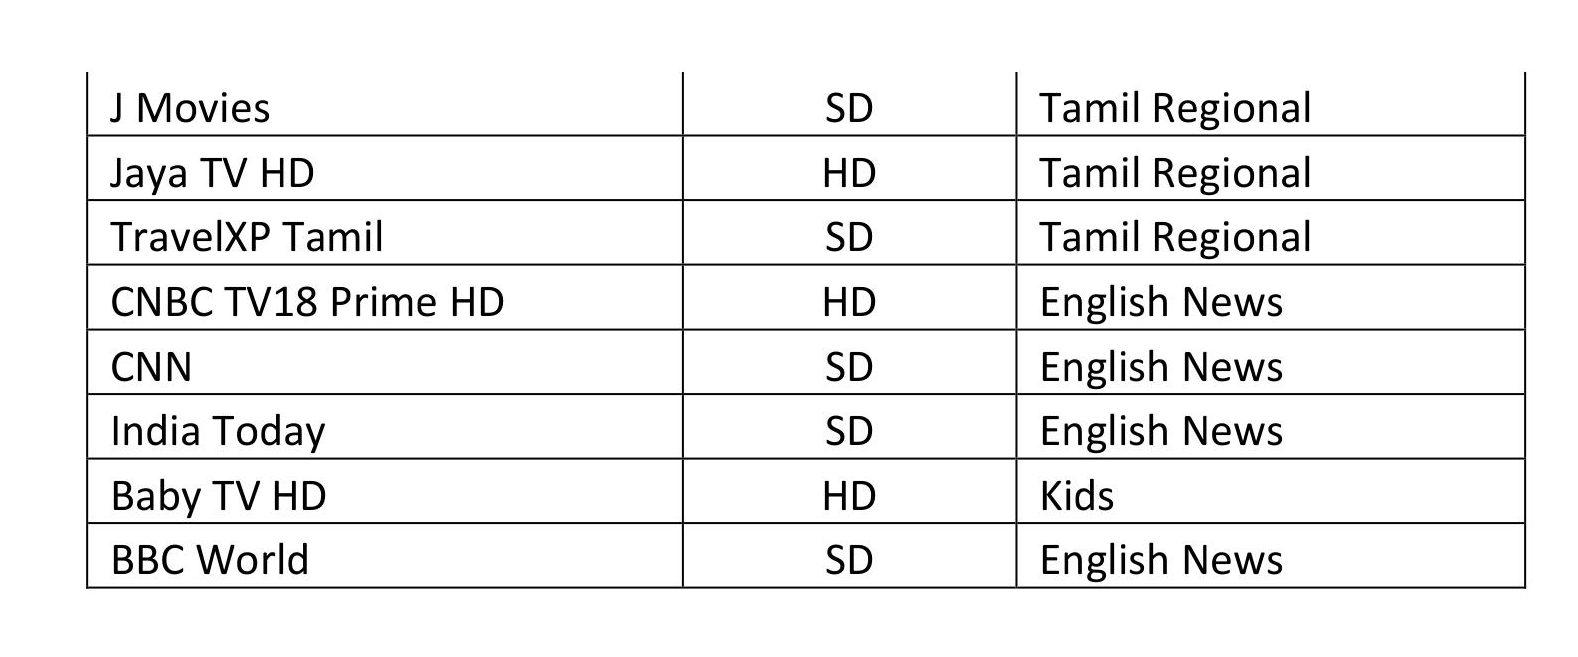 TamilFamilyKidsSportsHD